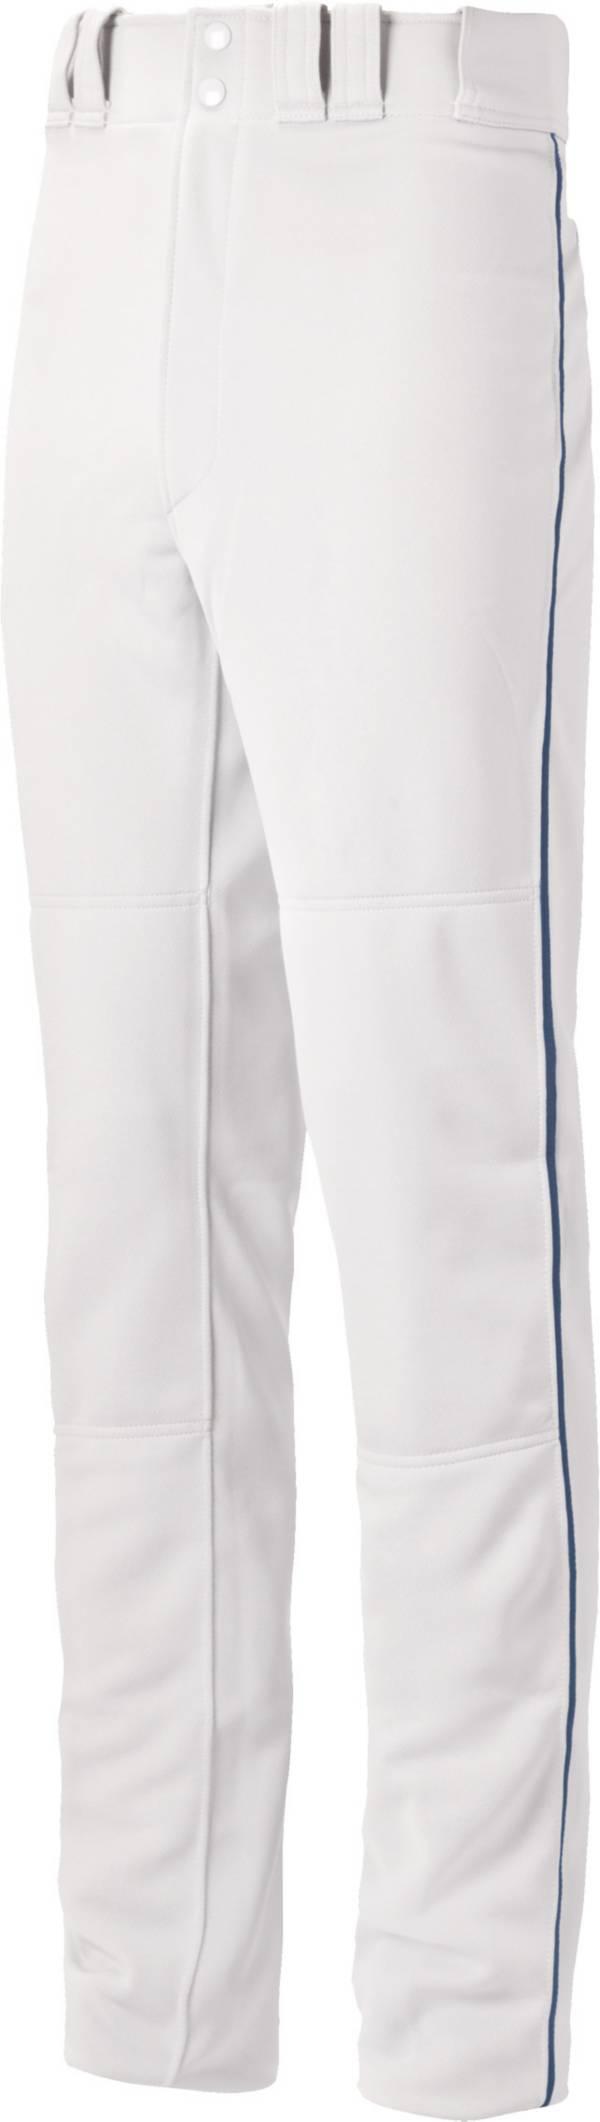 Mizuno Men's Premier Pro Piped Baseball Pants product image